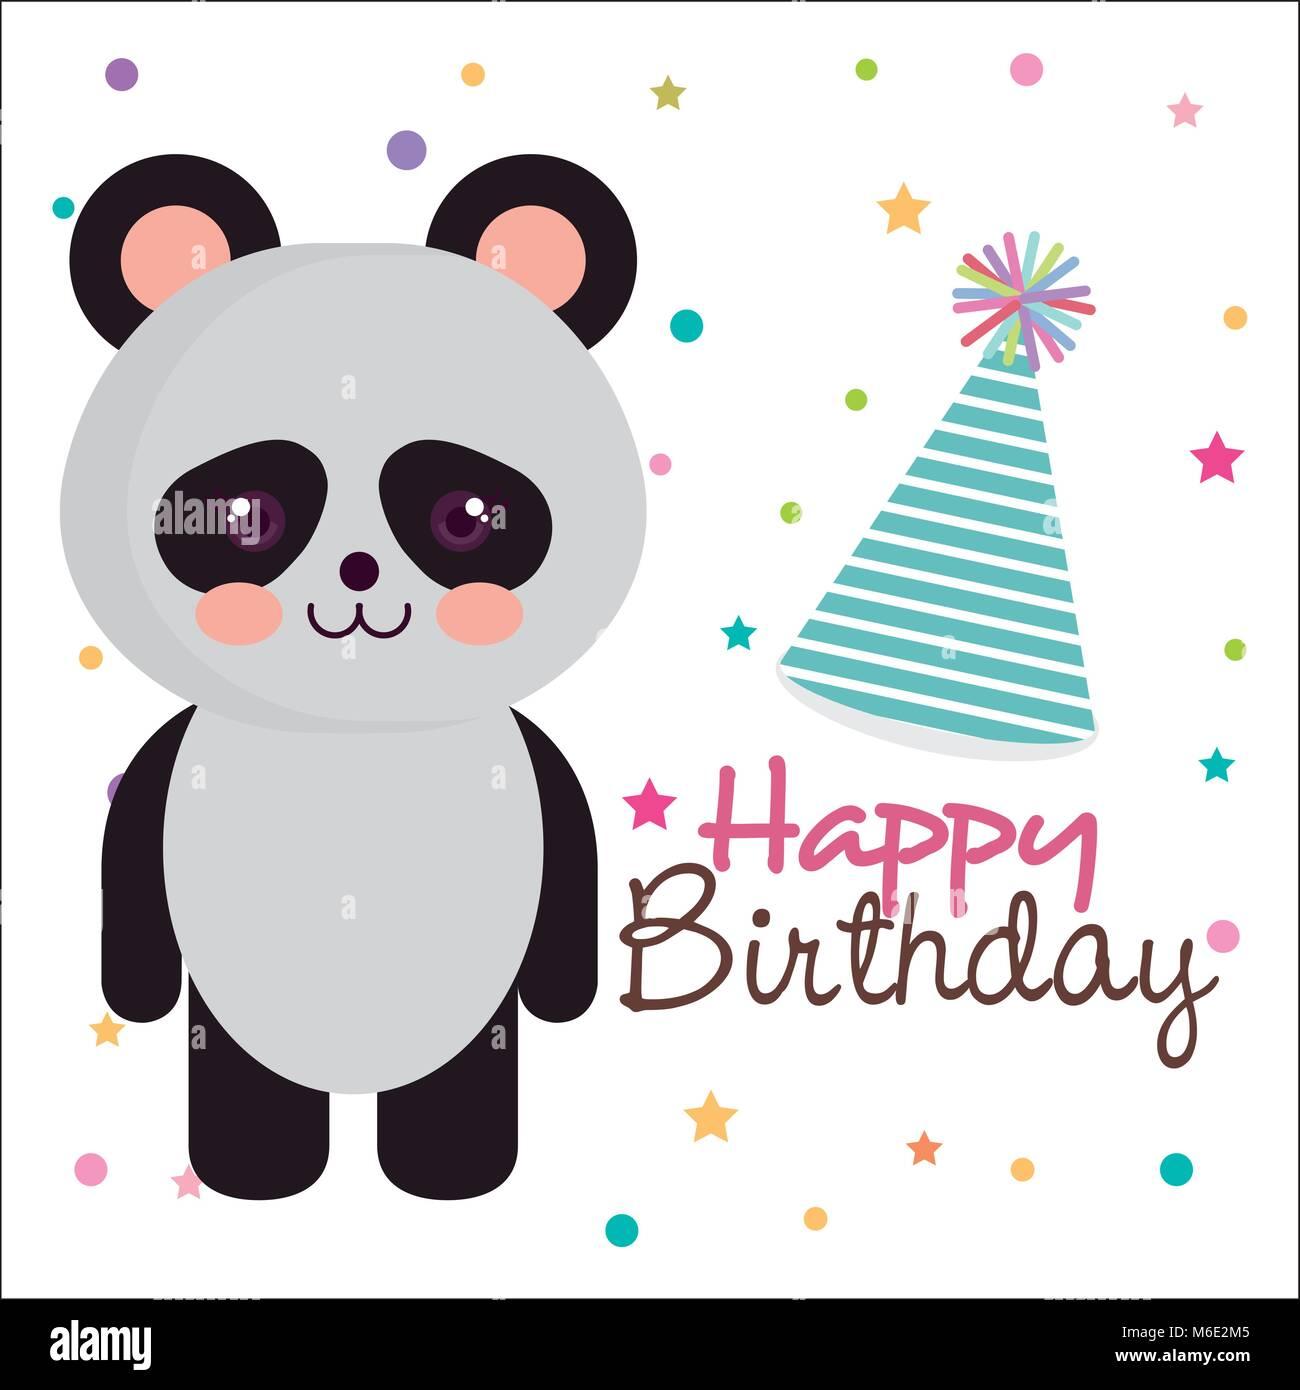 Happy birthday card with bear panda stock vector art illustration happy birthday card with bear panda bookmarktalkfo Choice Image